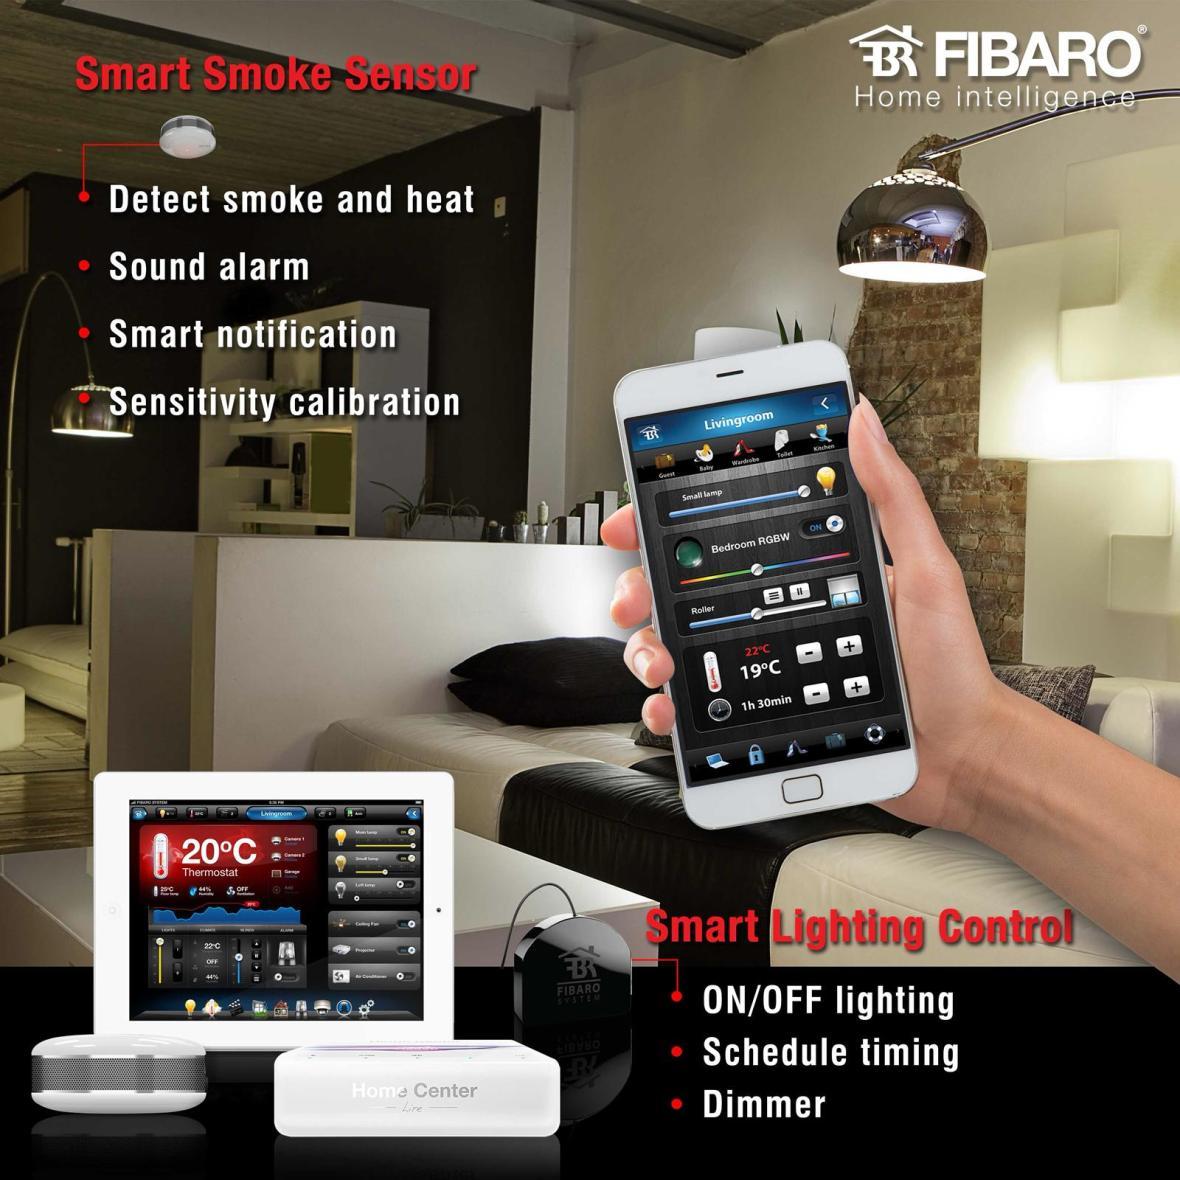 Belgravia Green Belgravia Green Fibaro Home Intelligence App Smart Smoke Sensor Detector & Smart Lighting Control, developer sales, sales team, clara heng